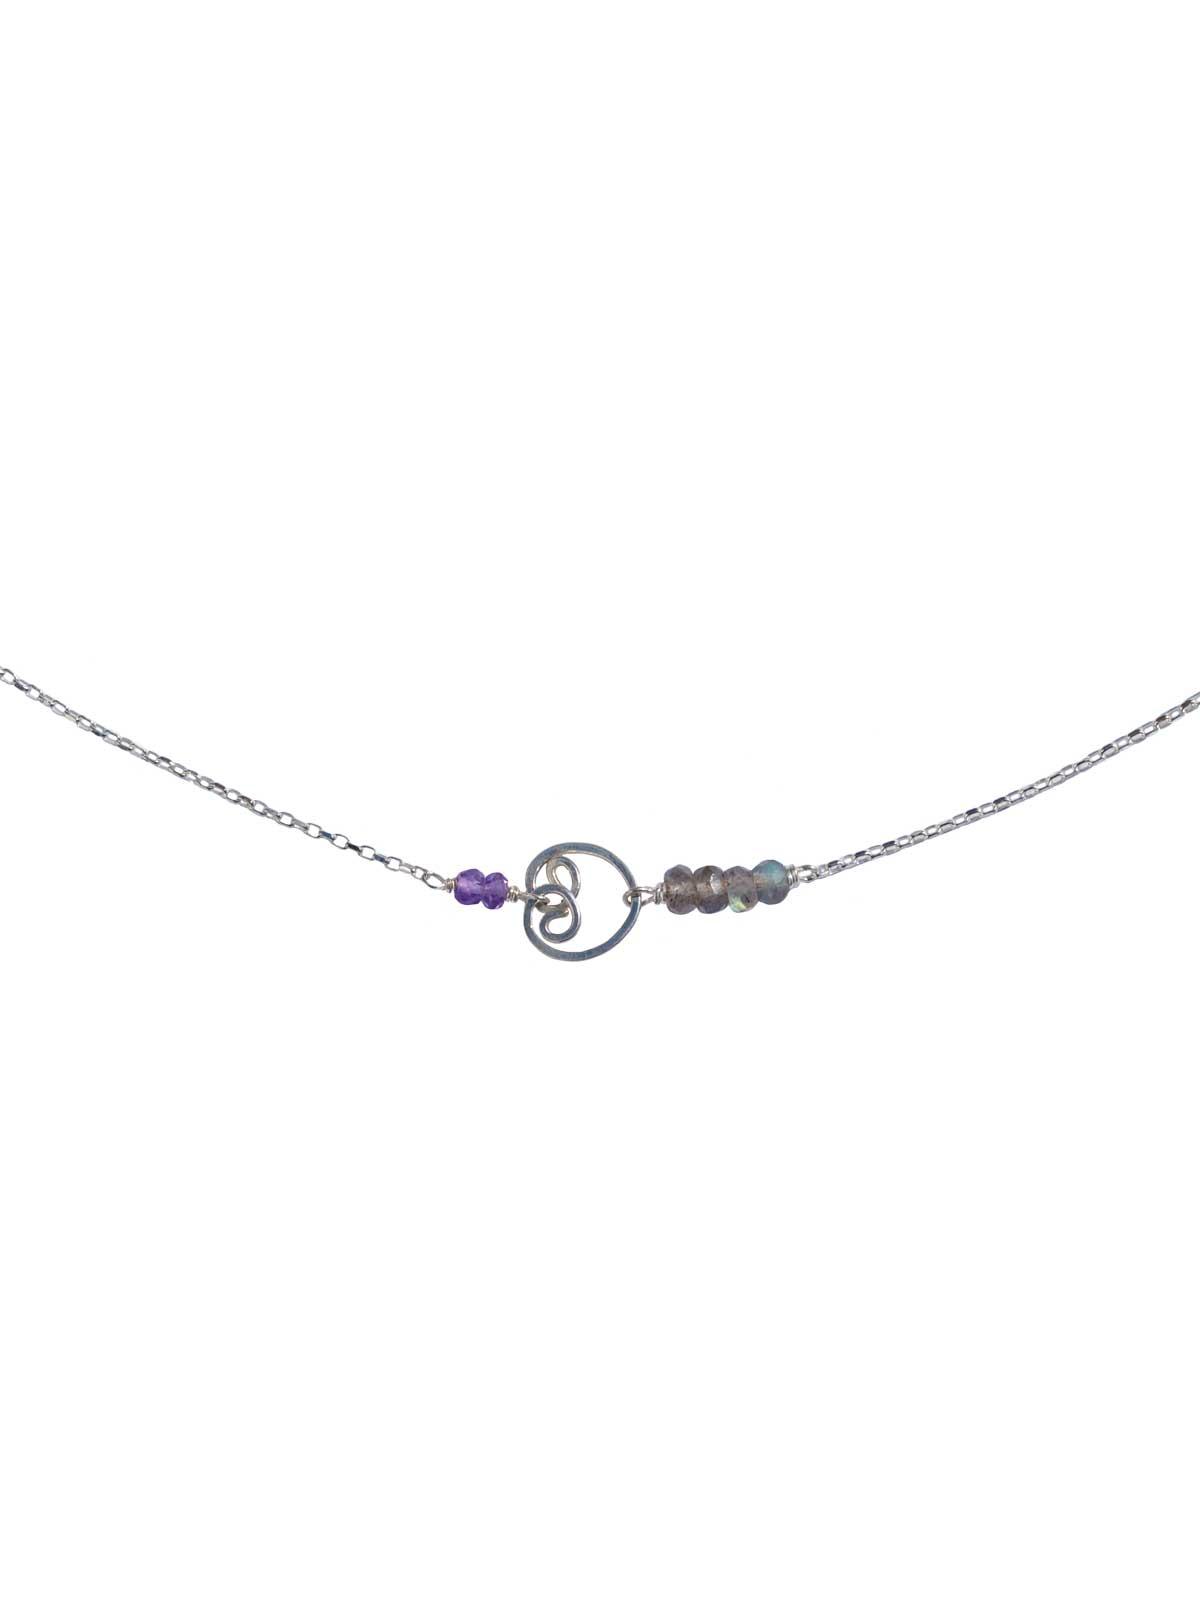 Buddha Necklace silver Labradorite Amethyst